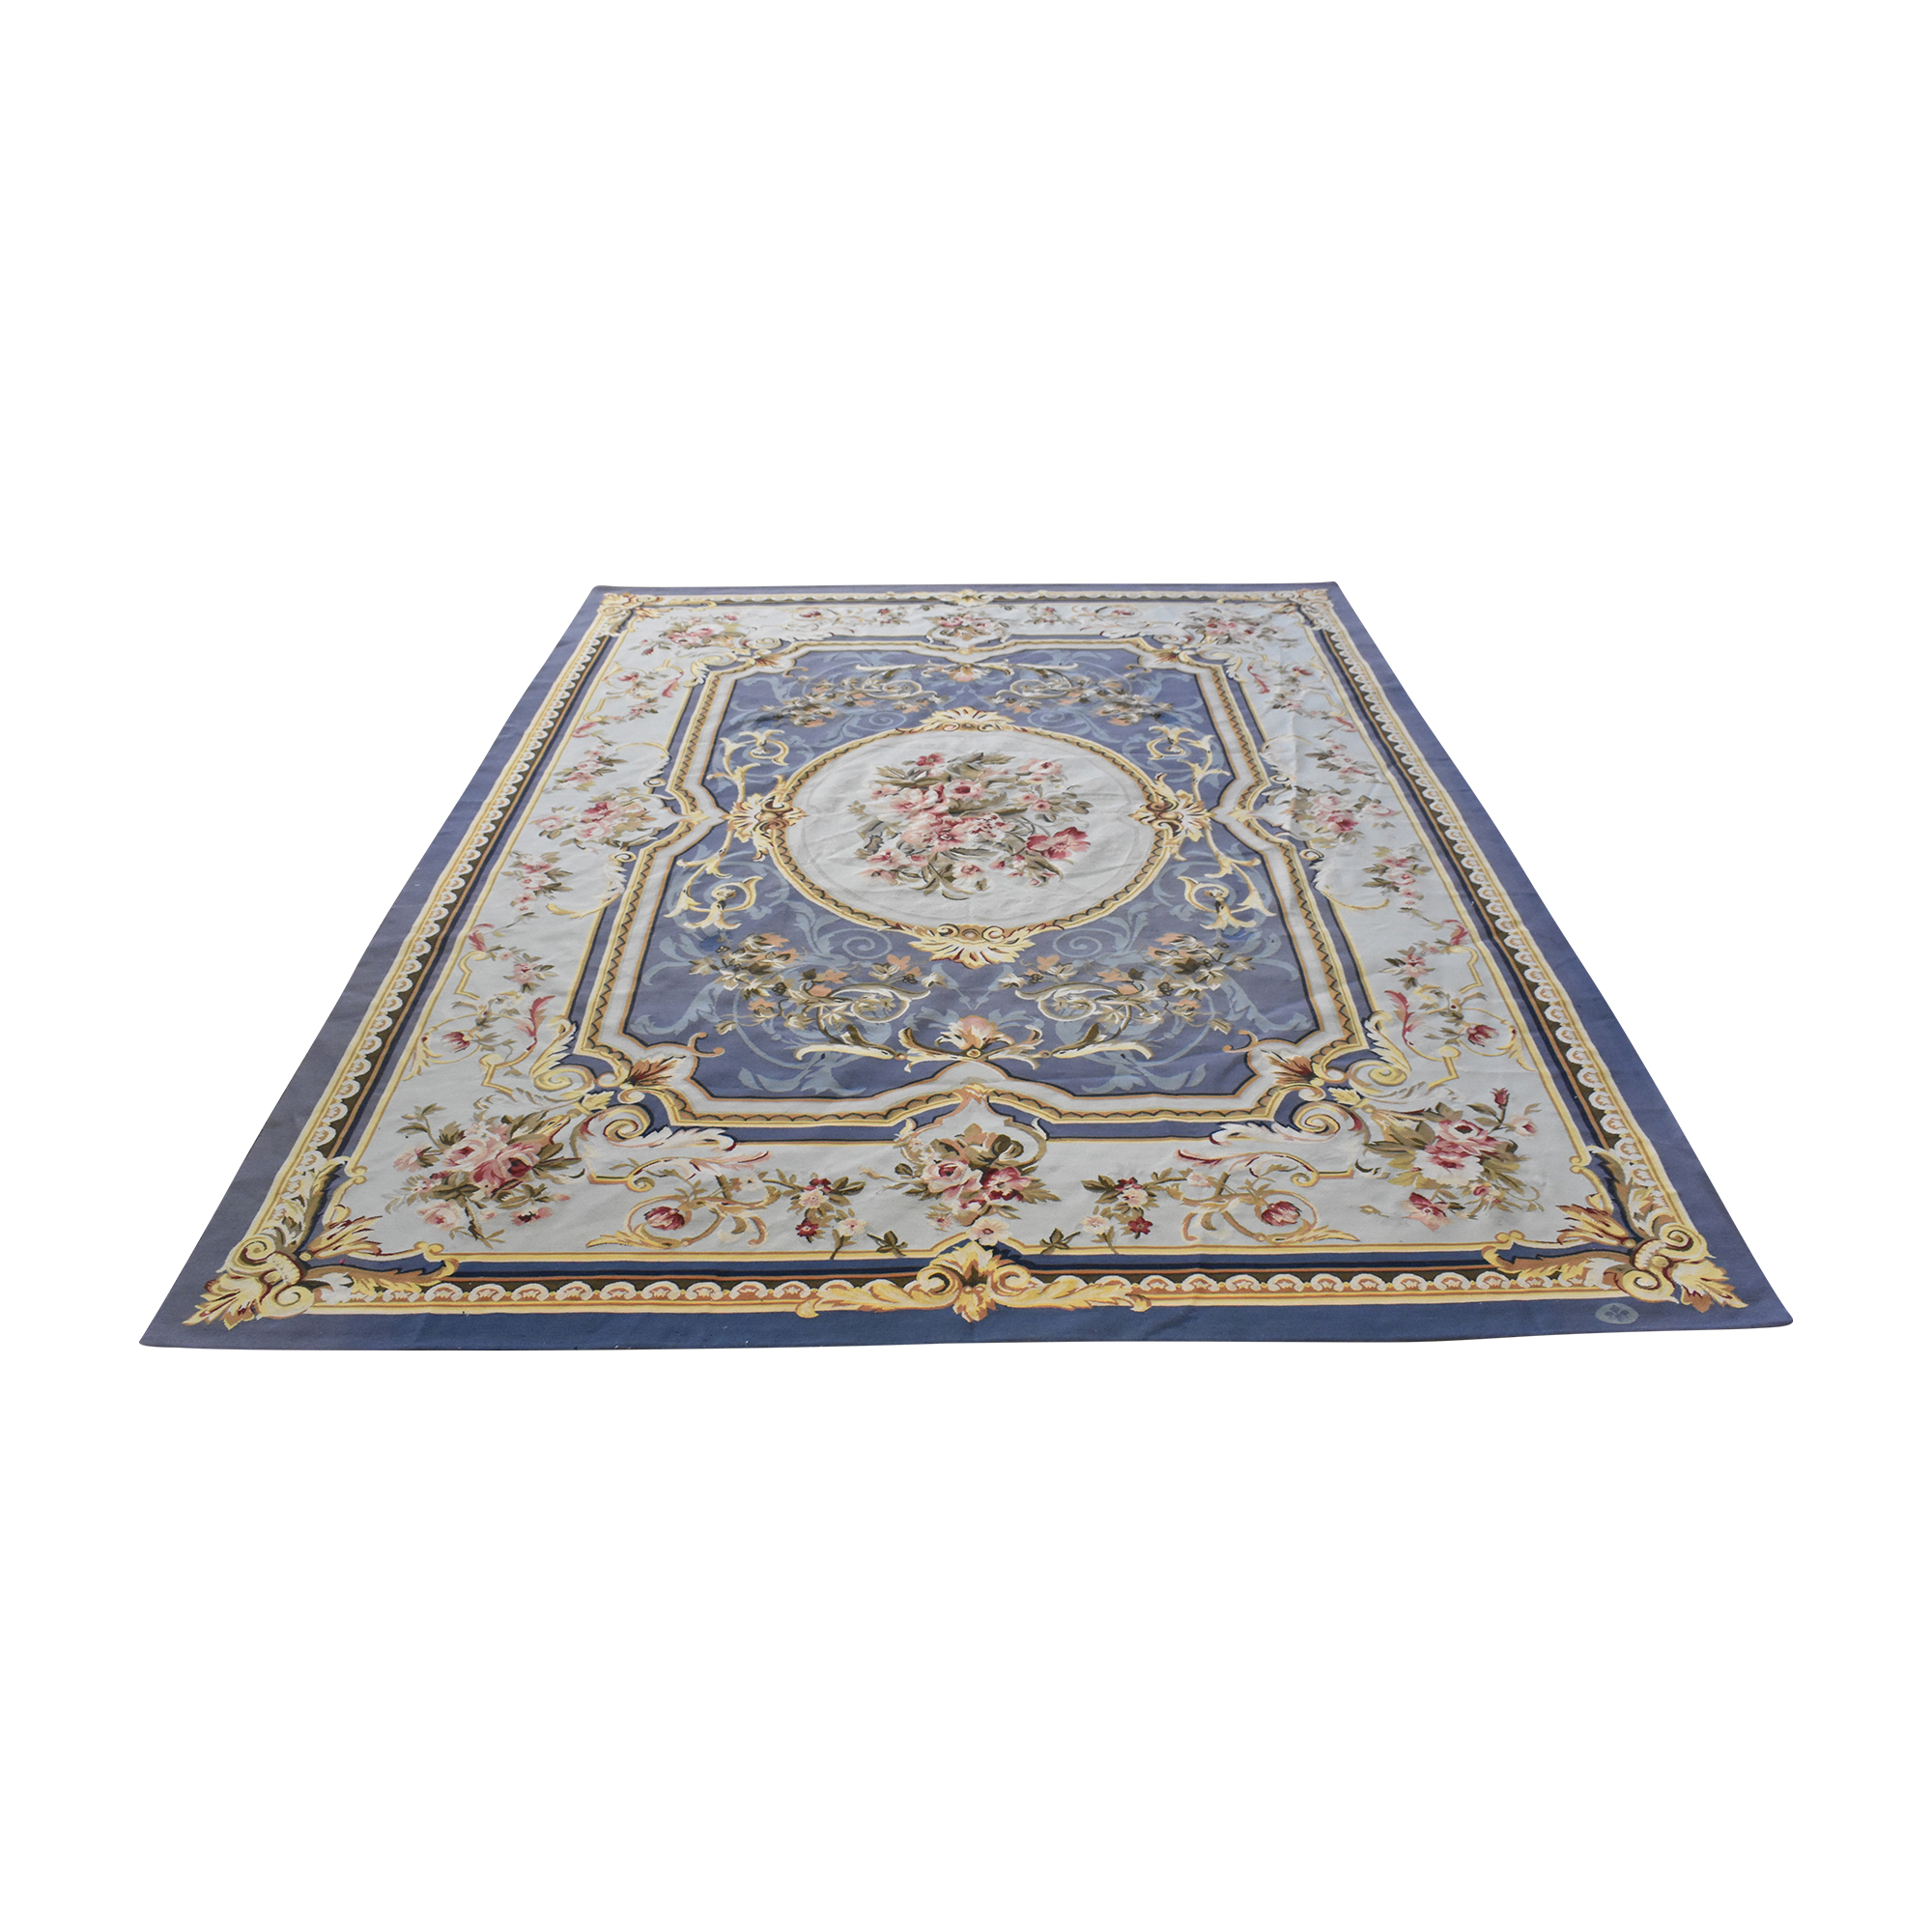 shop ABC Carpet & Home Aubusson-Style Area Rug ABC Carpet & Home Rugs